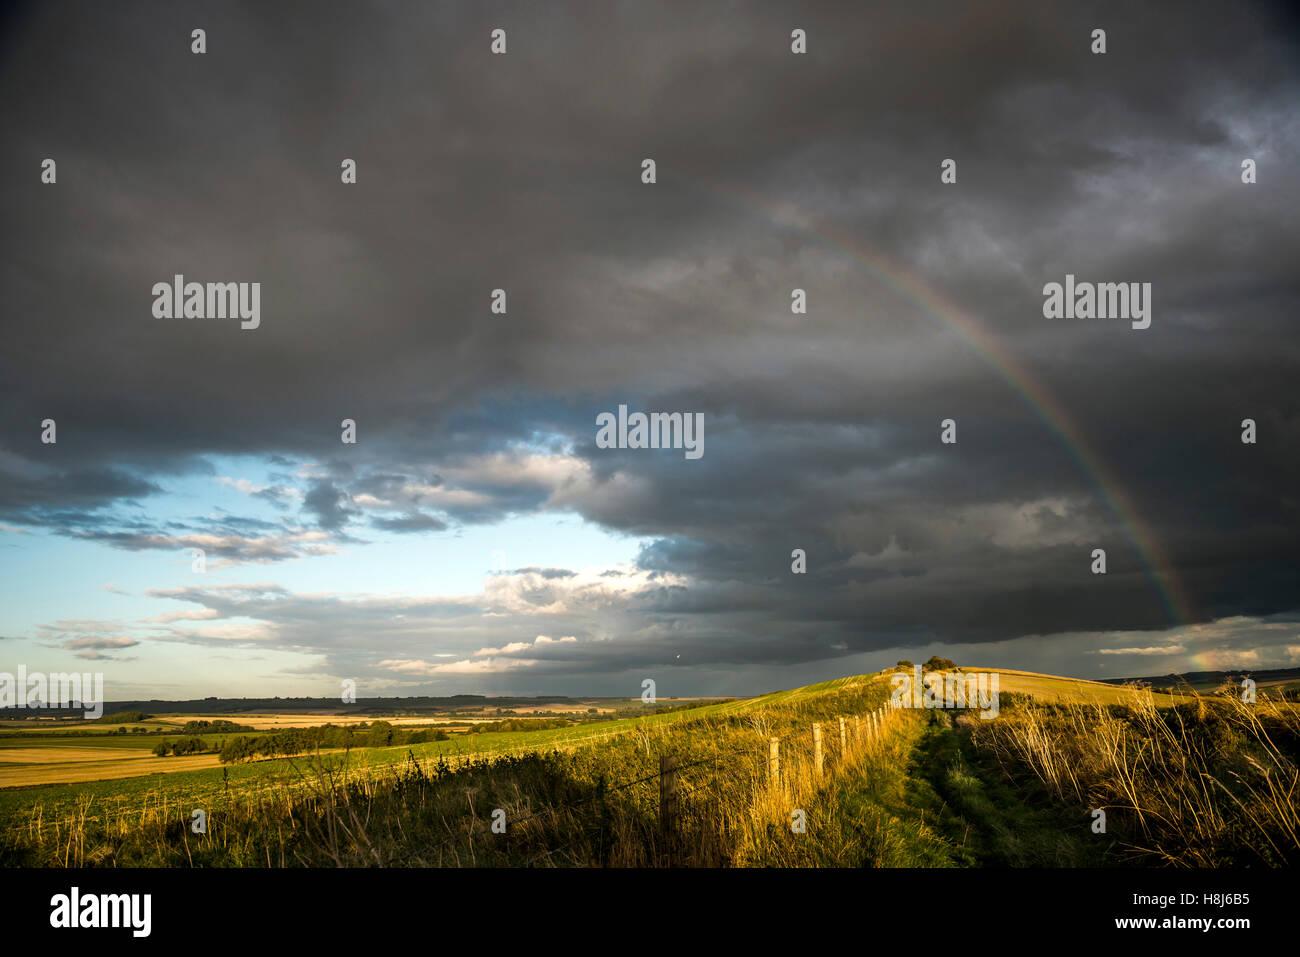 Rainbow over The Old Bath Road track near Cherhill, Wiltshire, UK Stock Photo